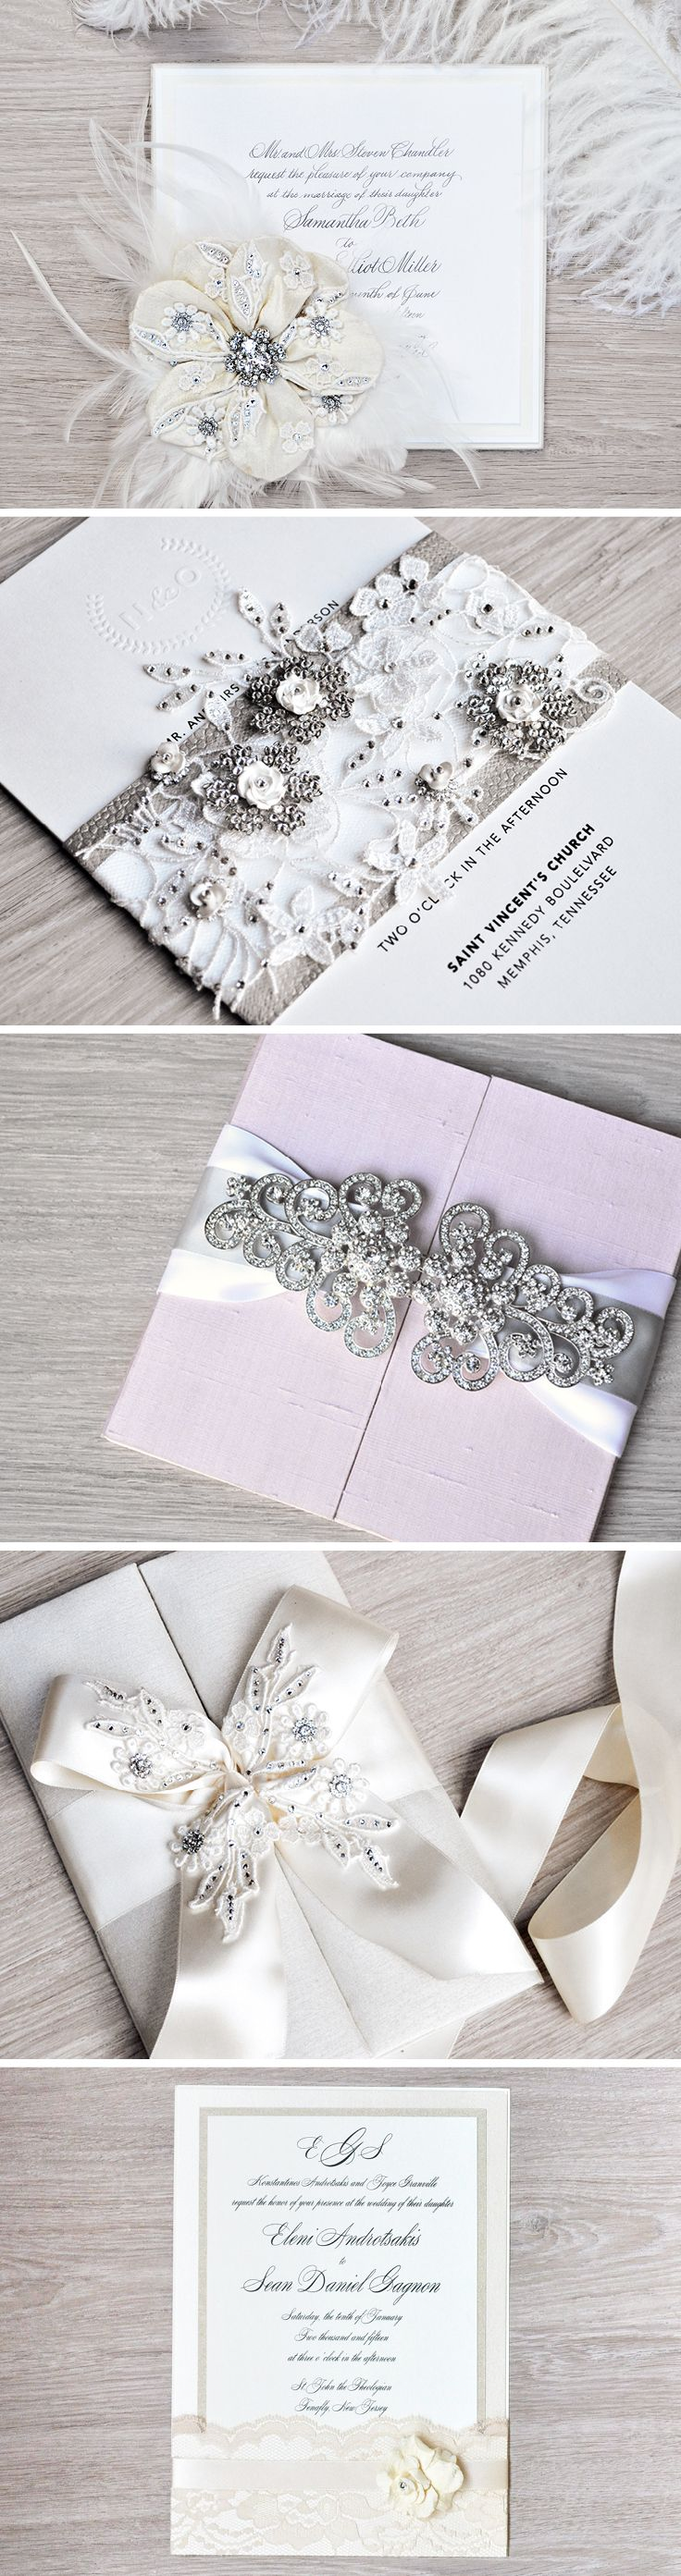 Custom Wedding Invitations and Wedding Branding 134